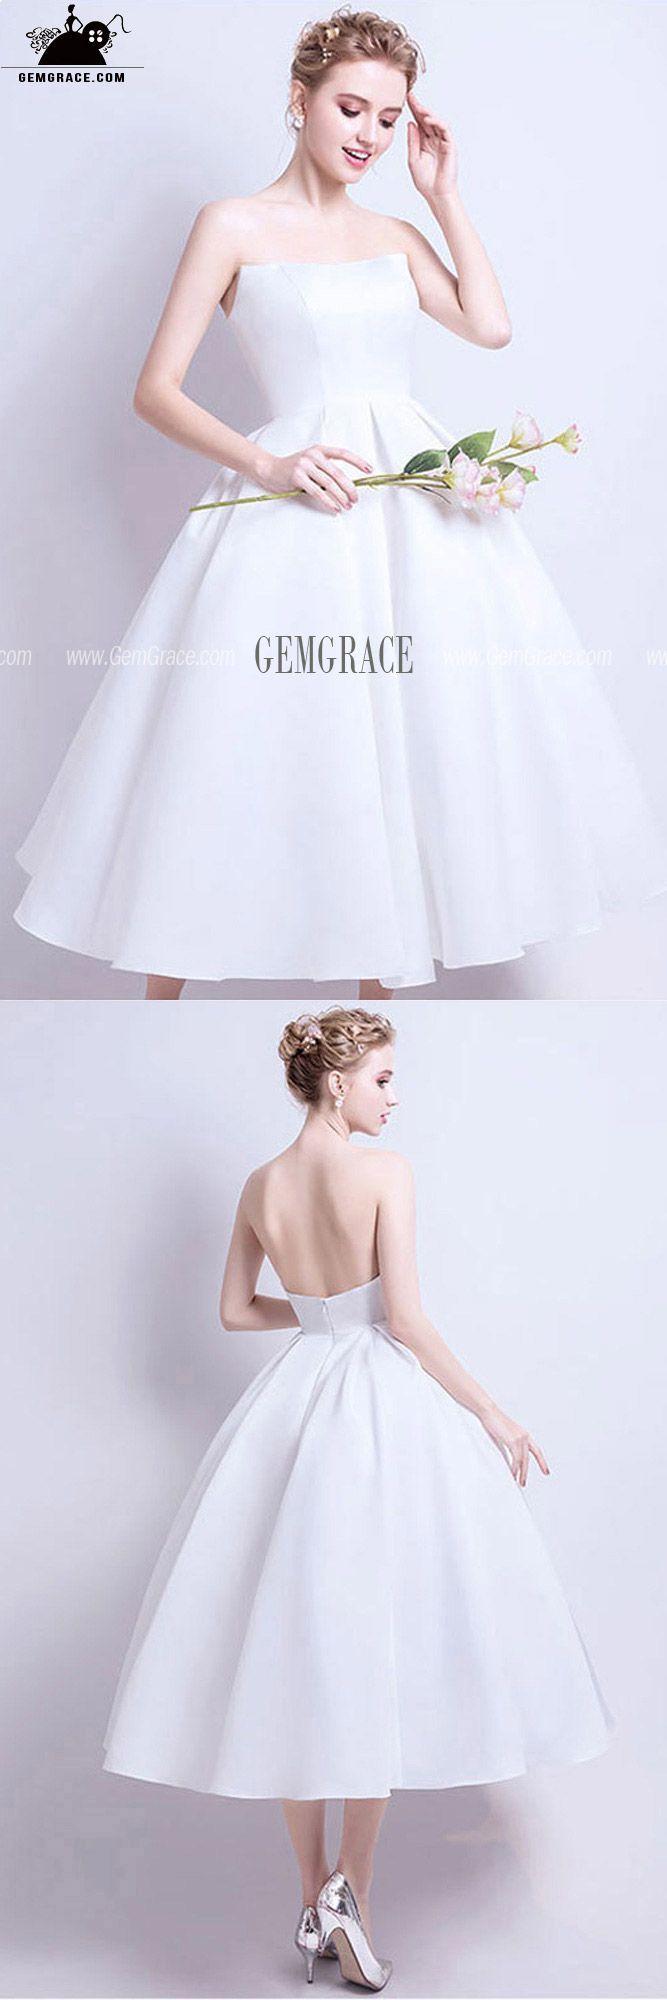 Cute Tea Length Ballgown Wedding Party Dress For Brides Short Wedding Dress 1950s Wedding Dress Tea Length Simple Wedding Dress Short [ 2000 x 667 Pixel ]